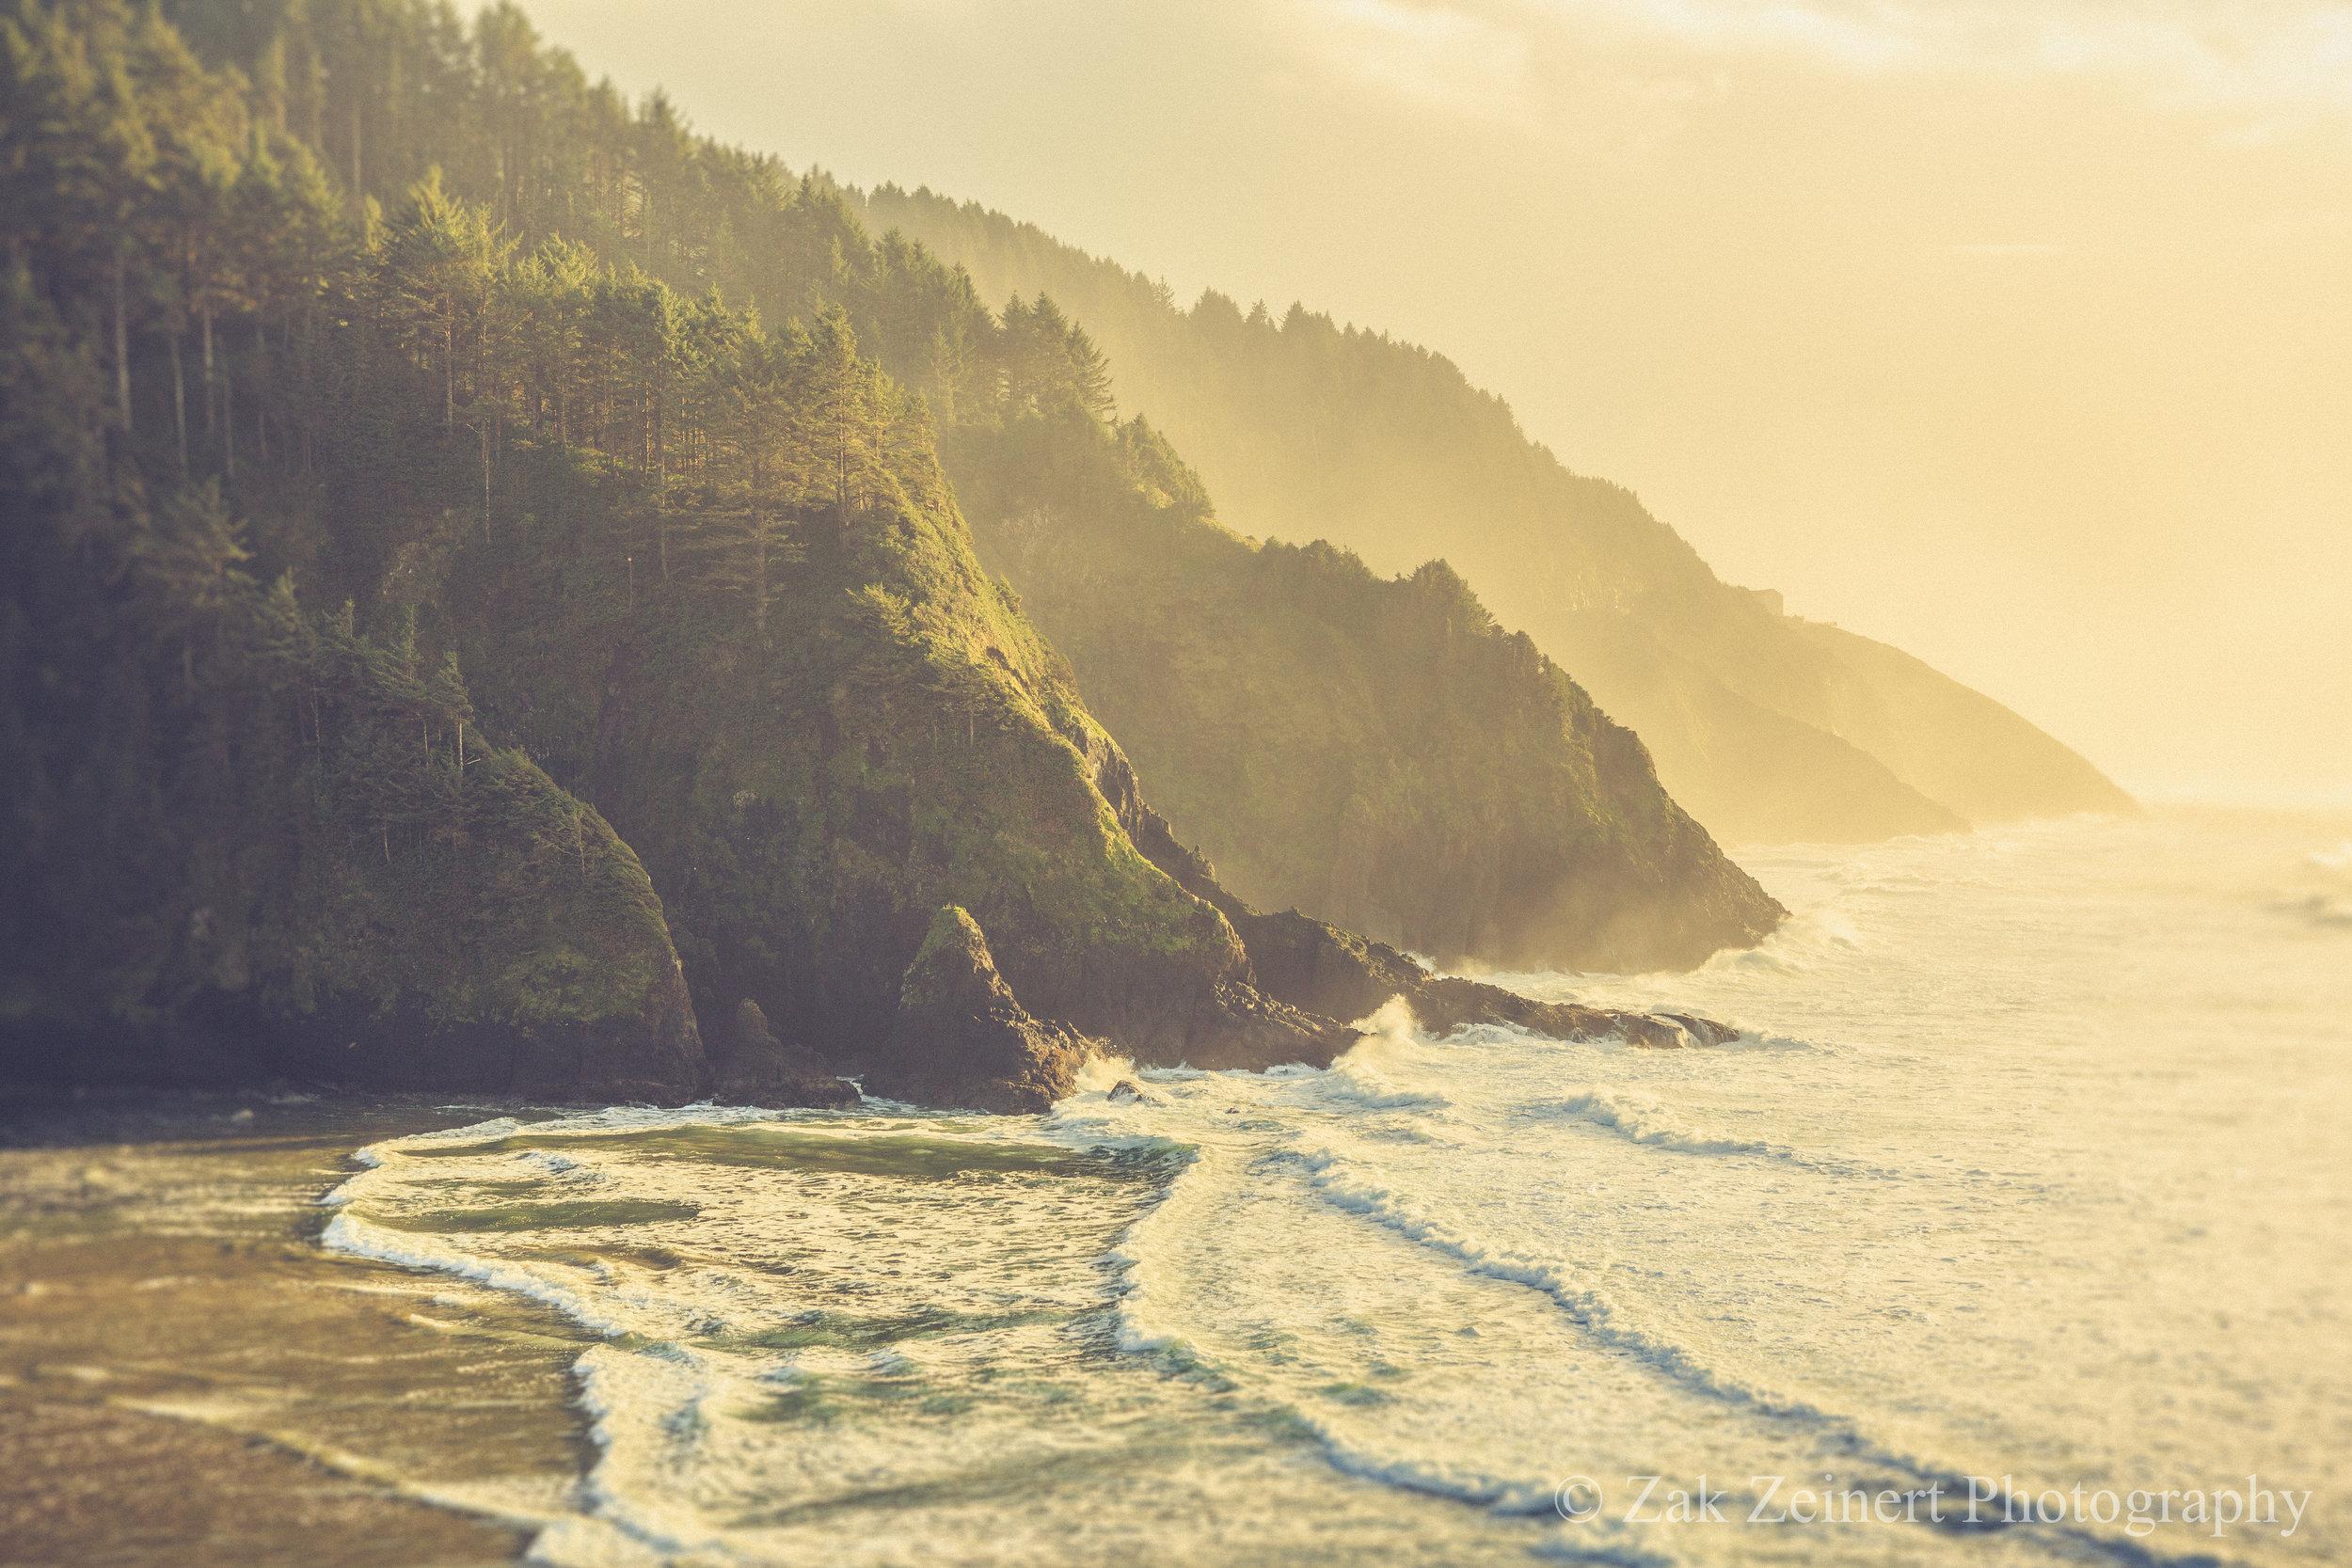 Day 3 on the Oregon Coast